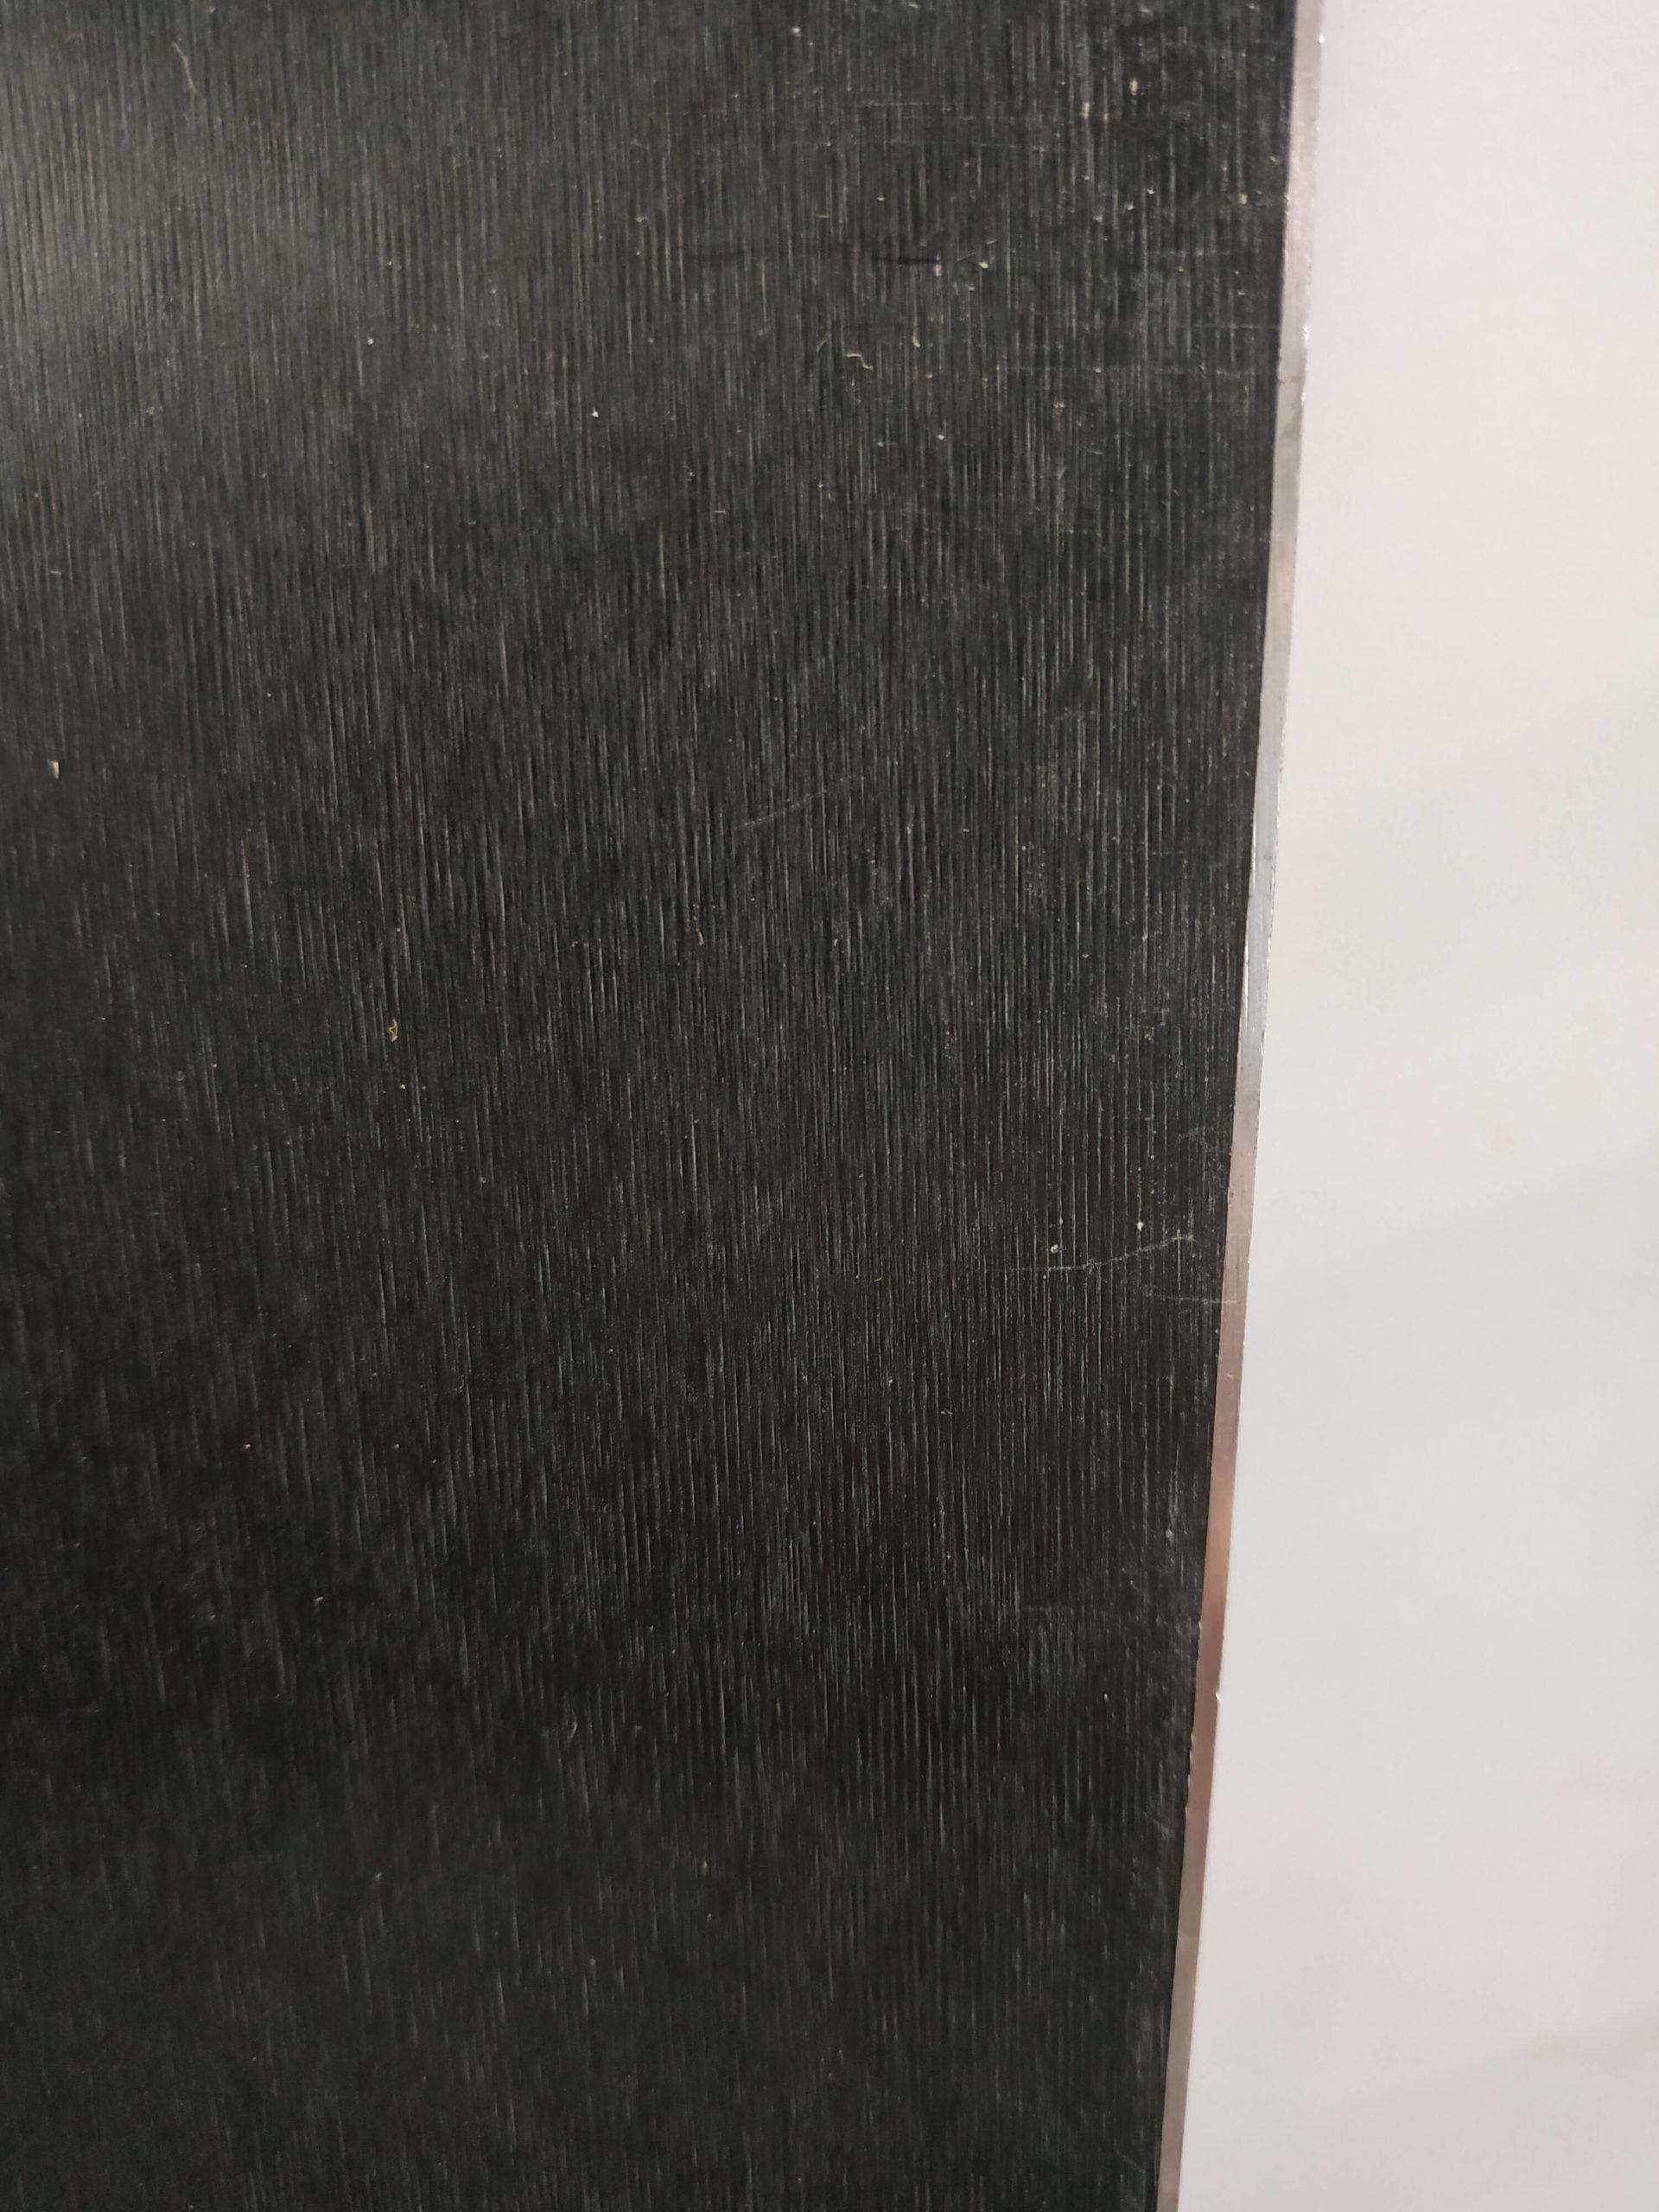 15. Volant Silver Spear 165 (8) R14